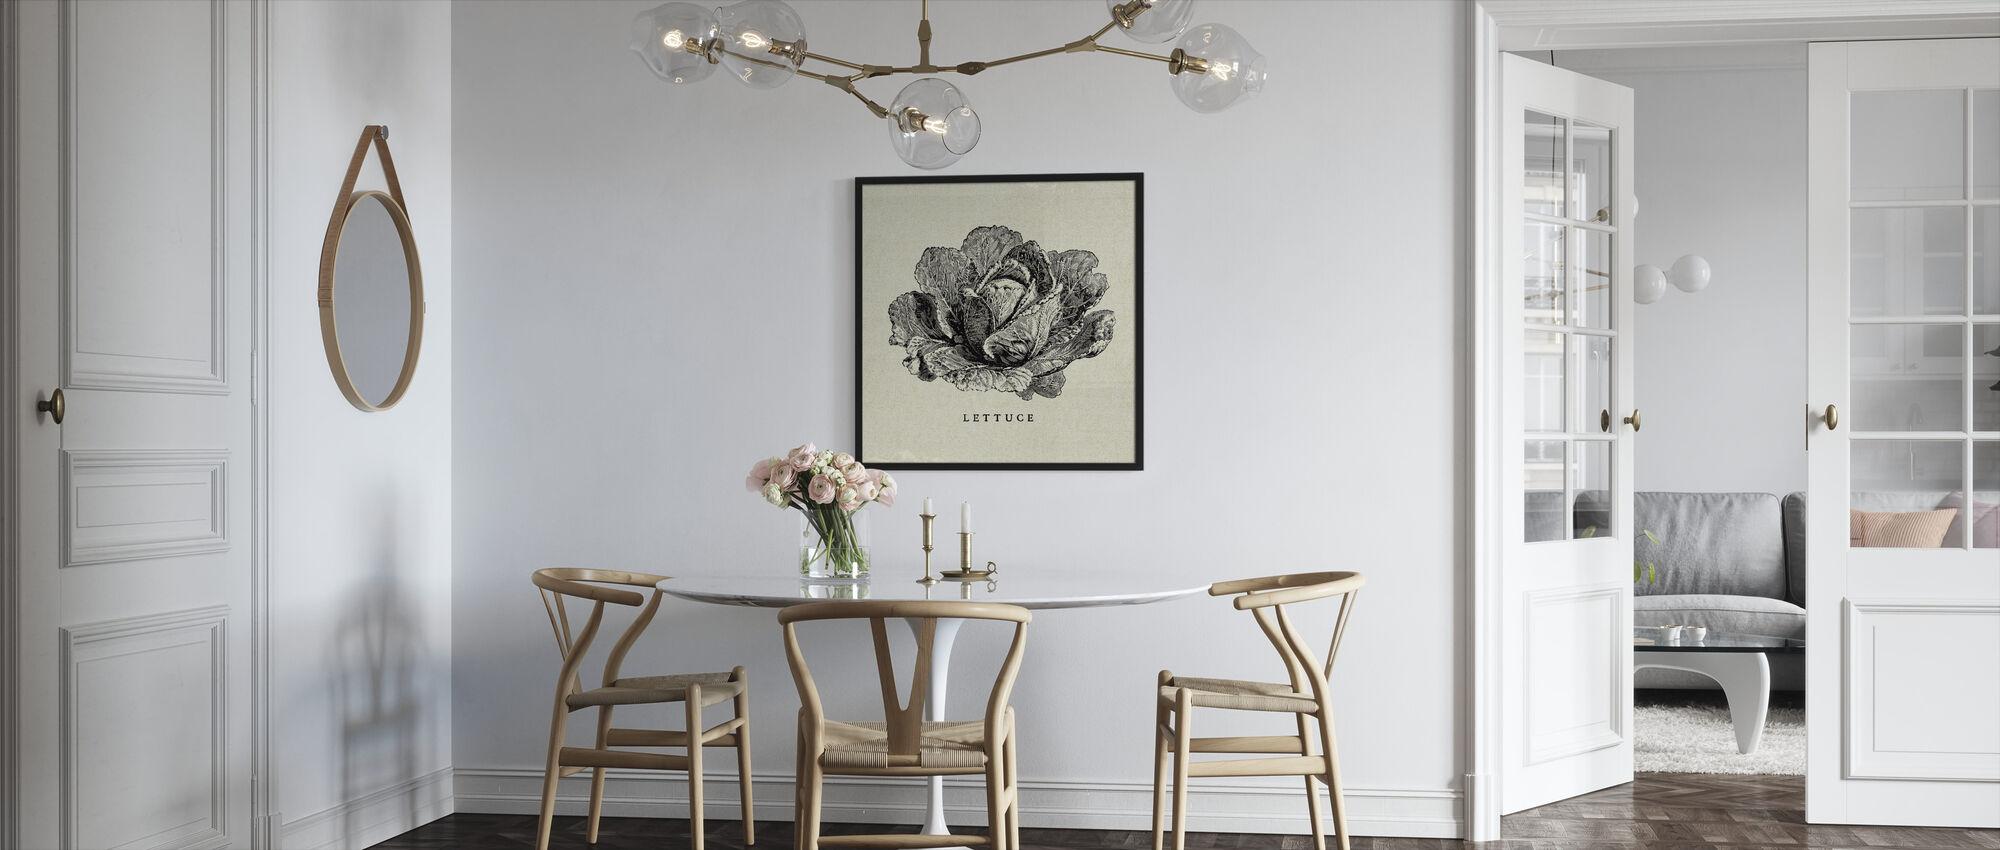 Keuken Illustratie - Sla - Ingelijste print - Keuken